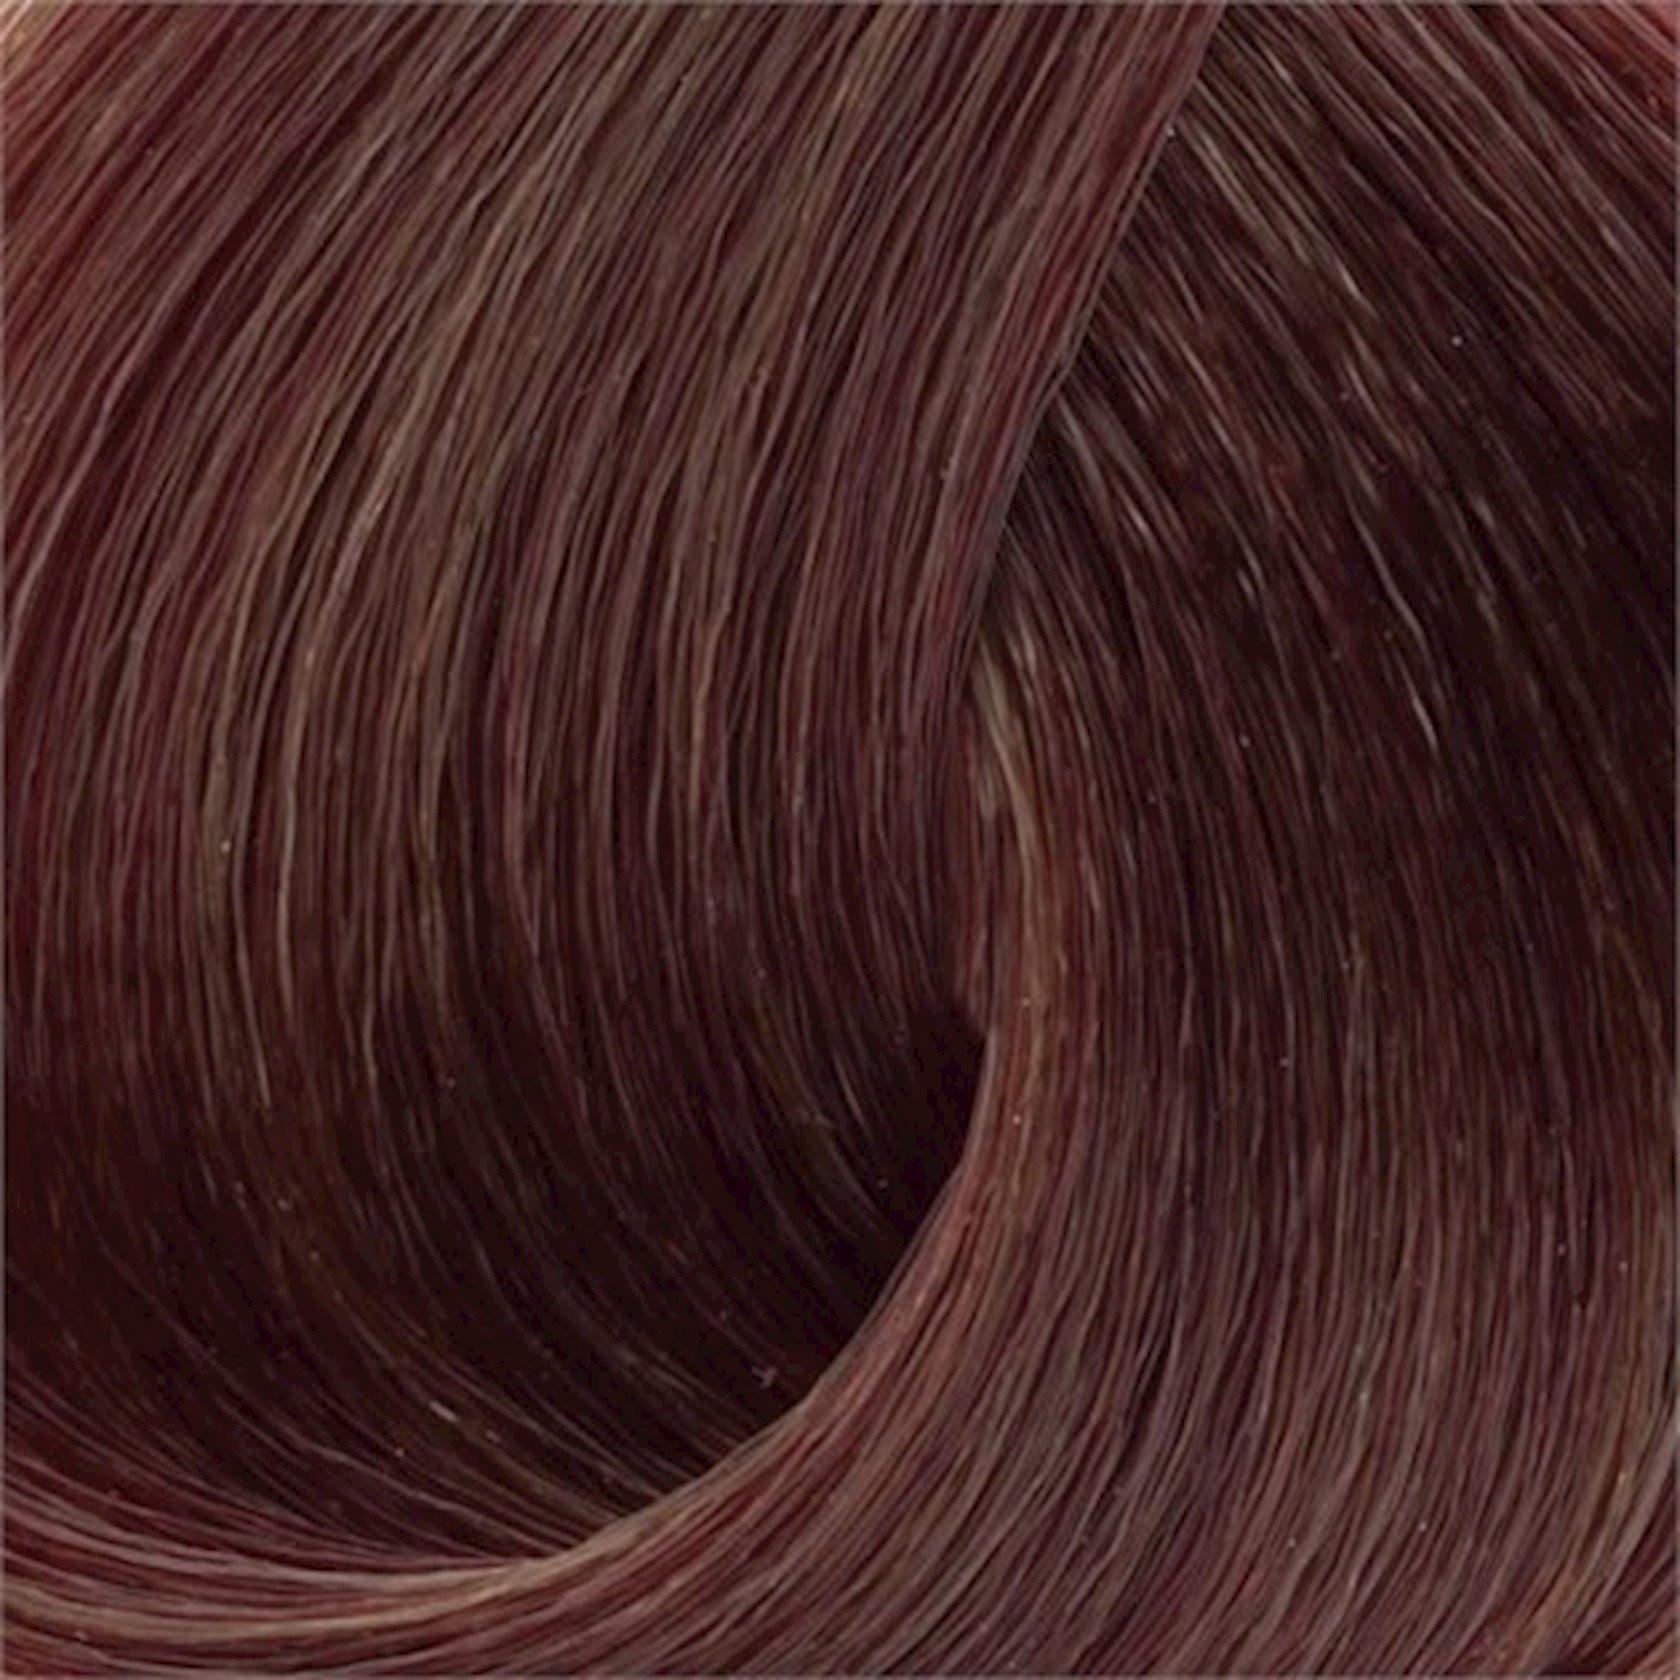 Saç üçün qalıcı krem boya Exicolor Permanent Hair Color Cream 100 ml №6.77 Kestane Kahve, Şabalıdı qəhvə